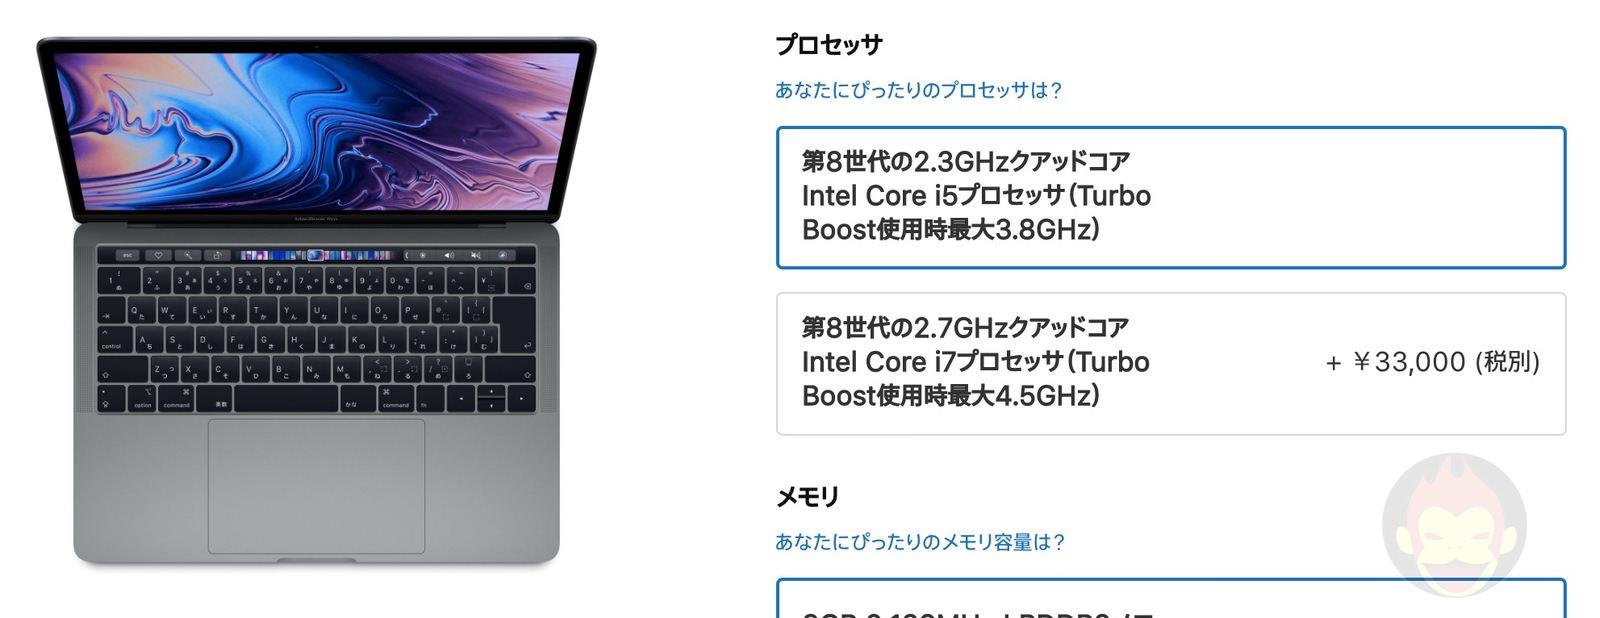 MacBook-Pro-CPU-Configuration-02